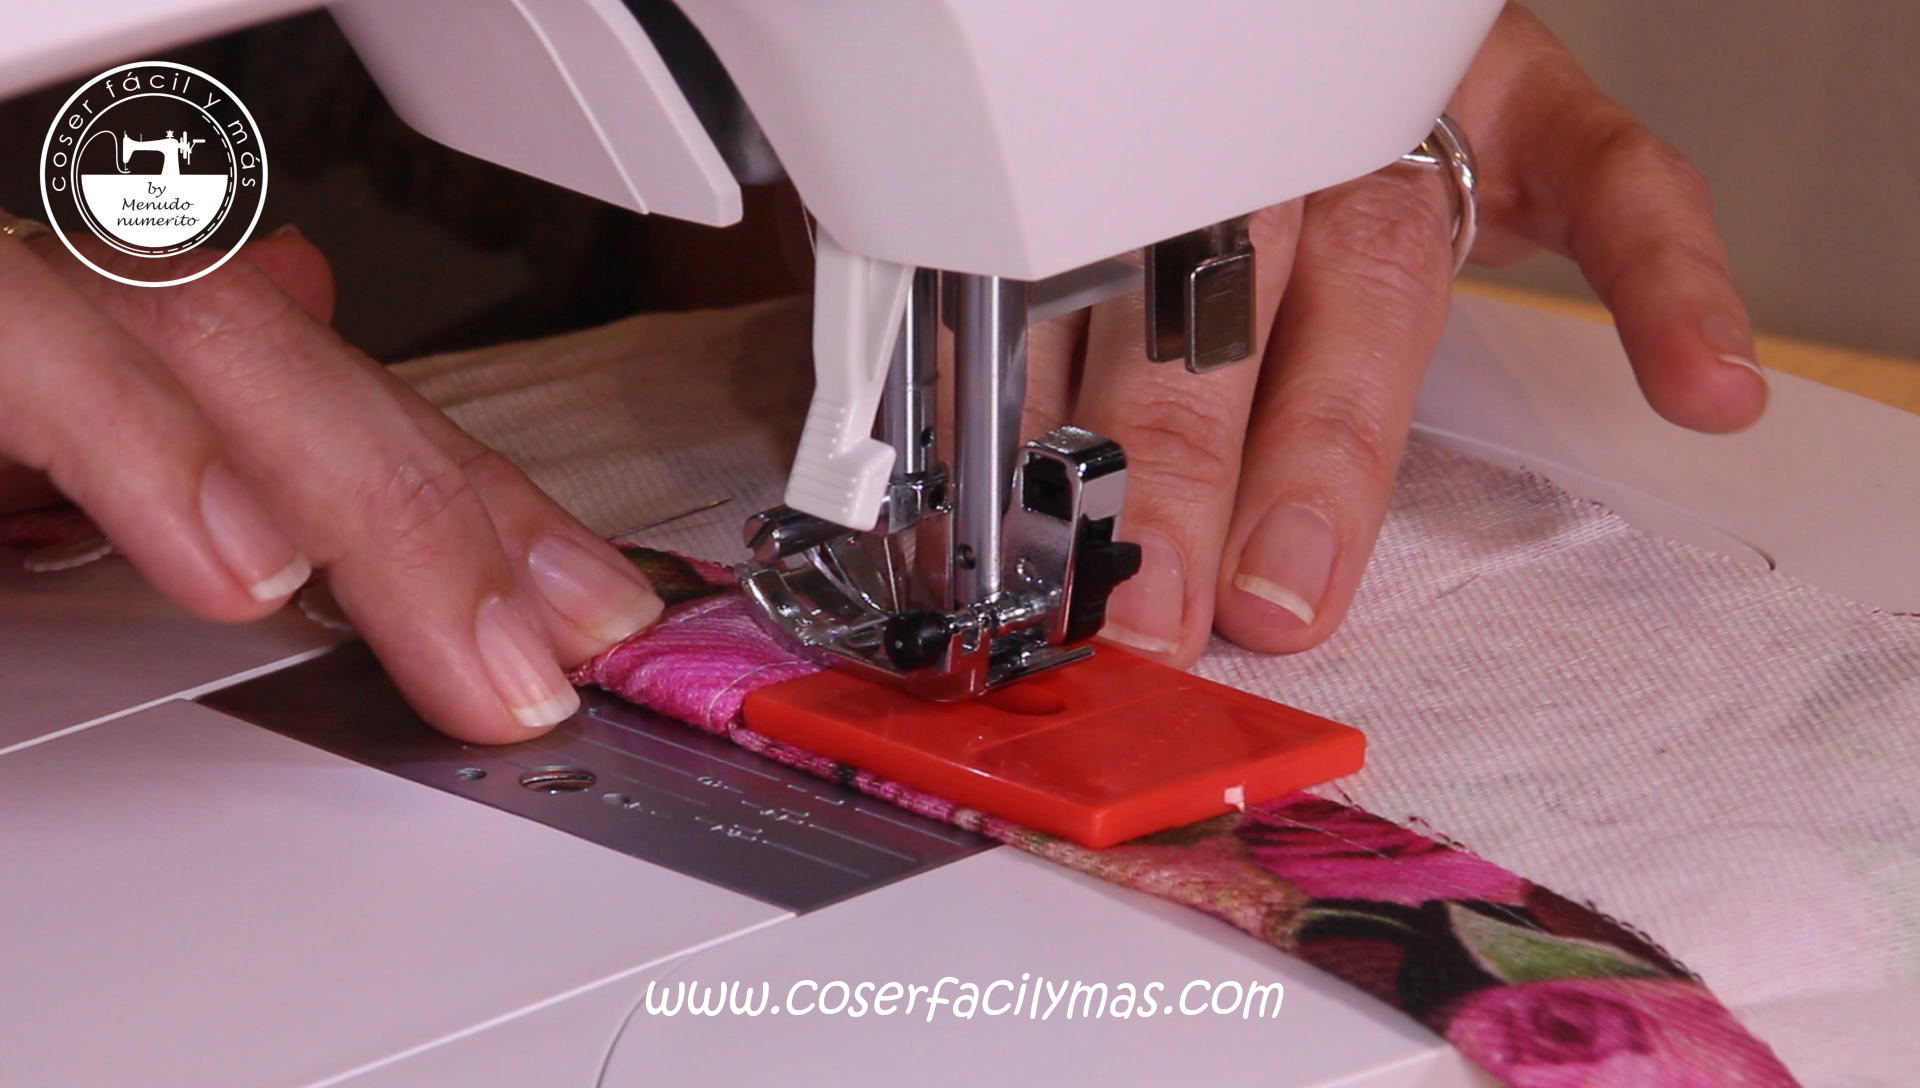 coser telas gruesas coser facil blogs de costura